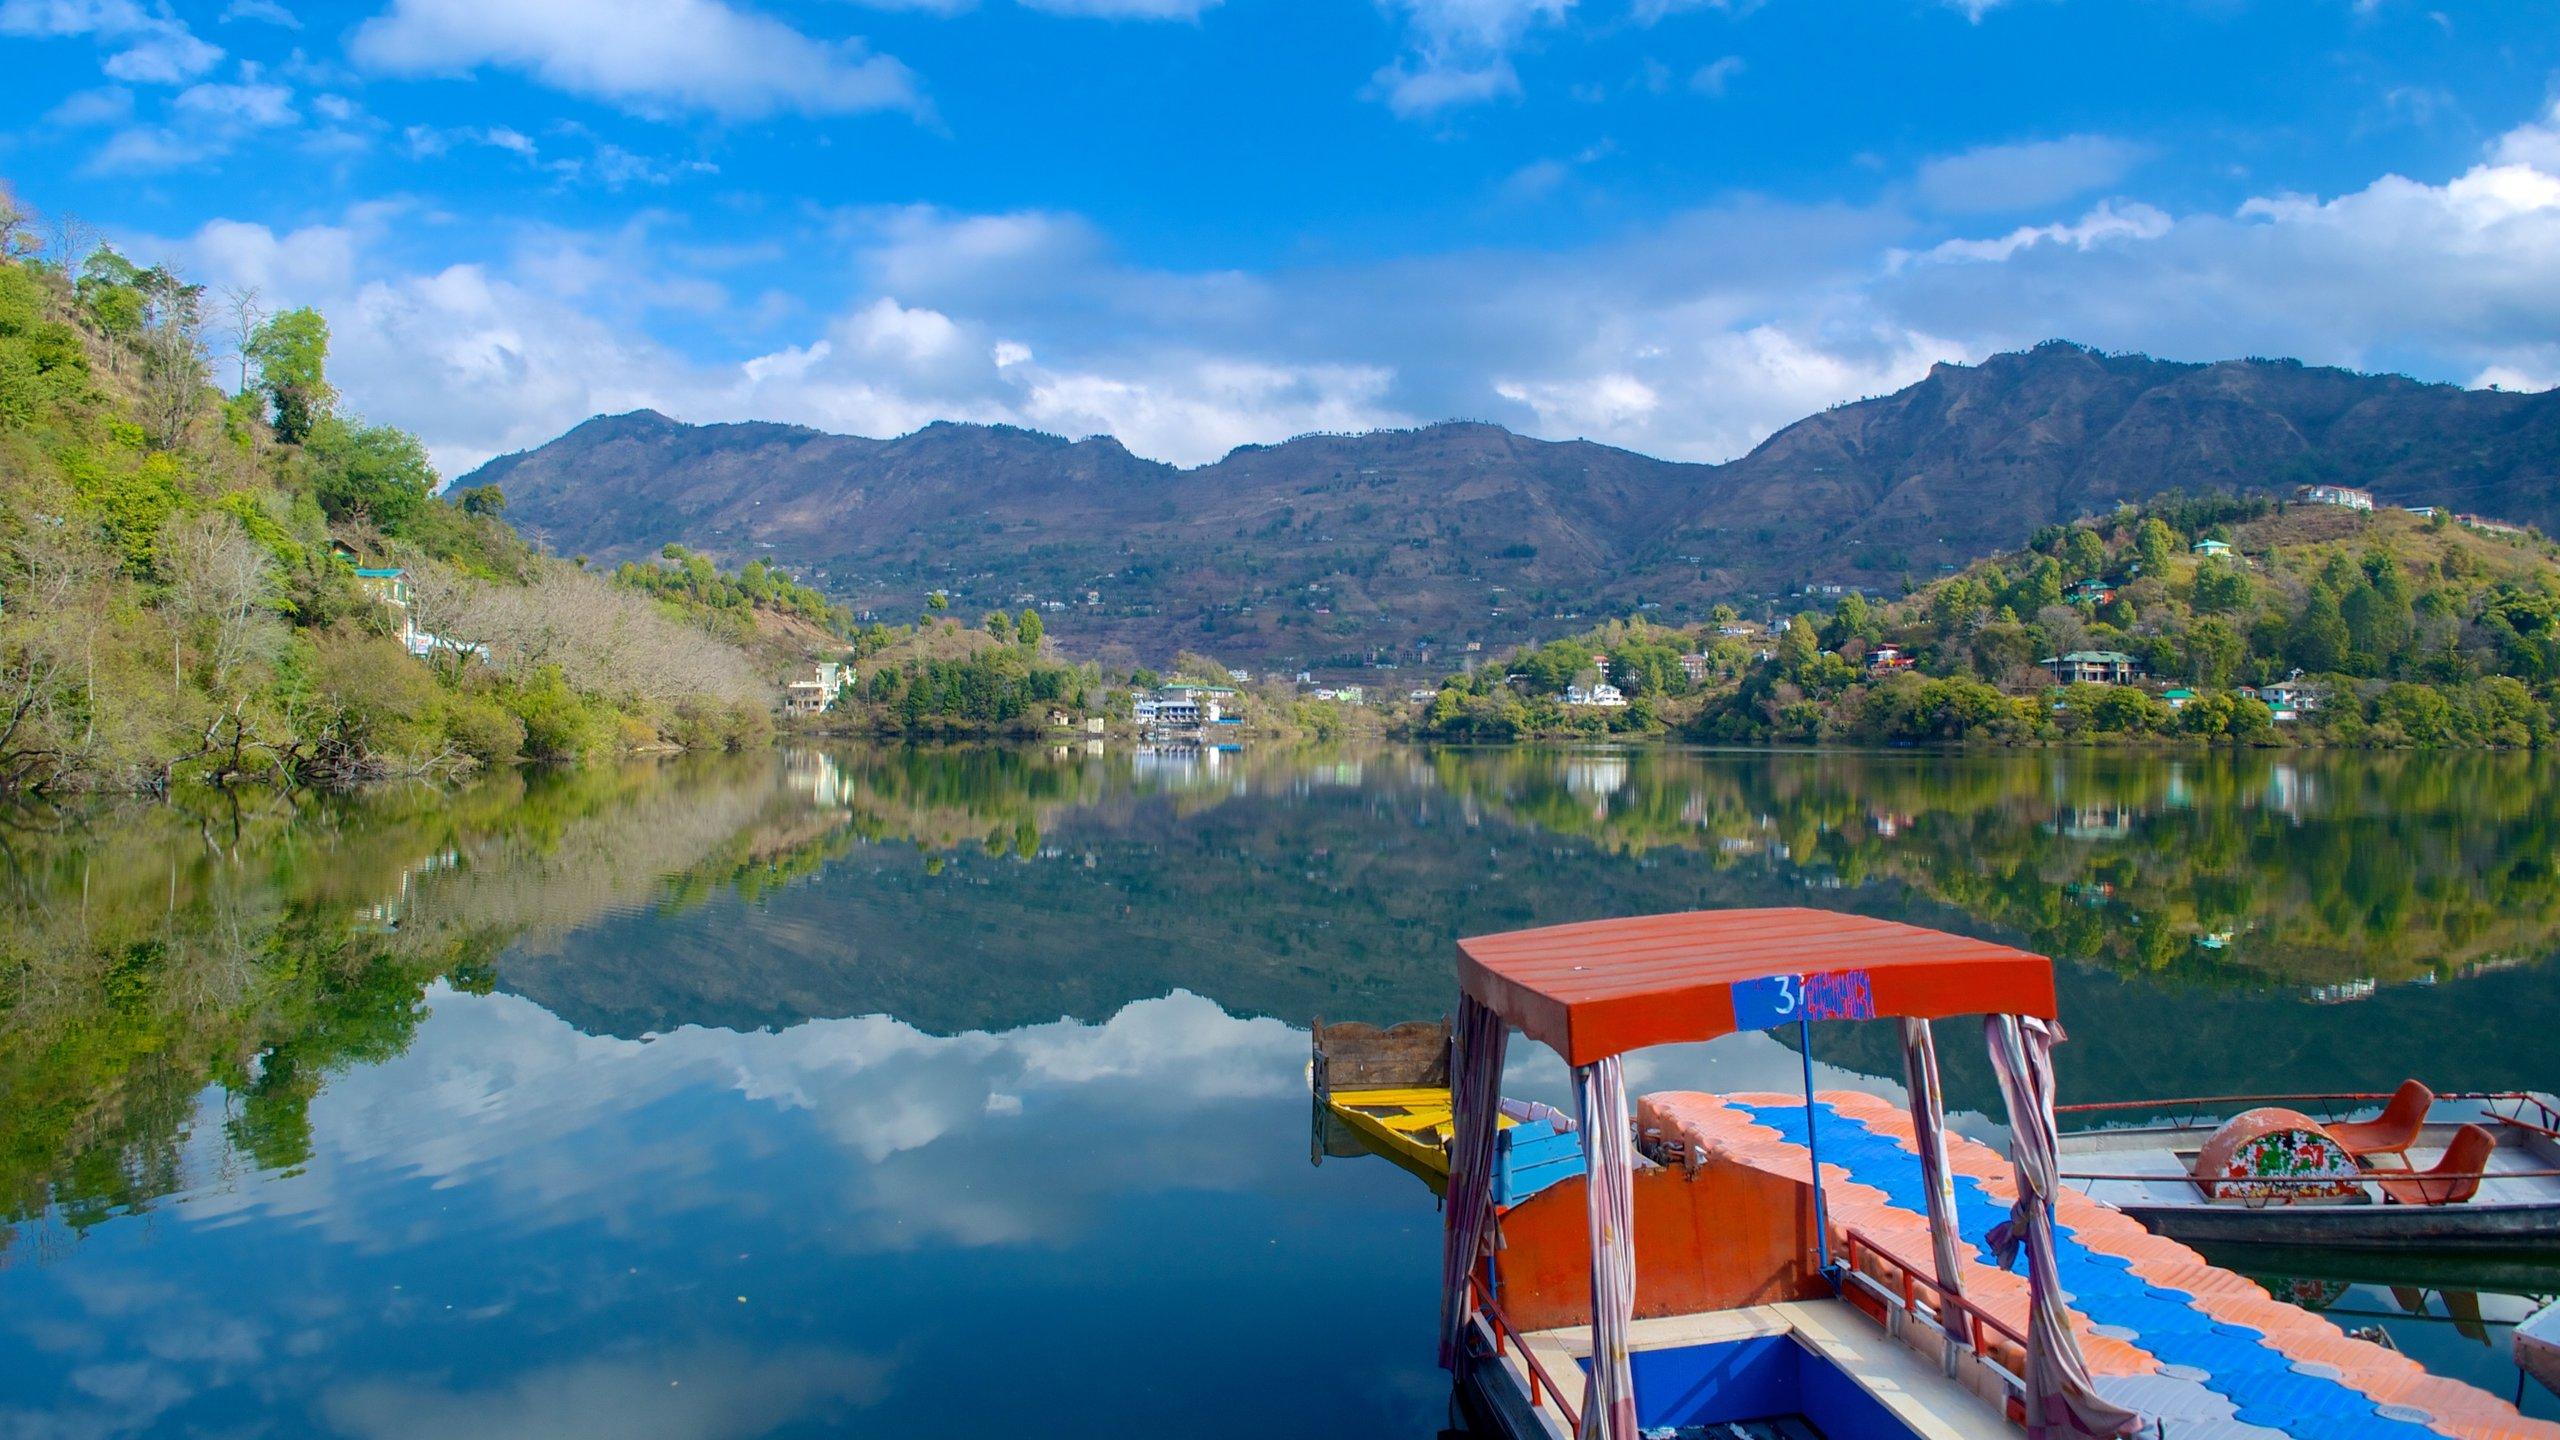 Distrito de Nainital, Uttarakhand, India